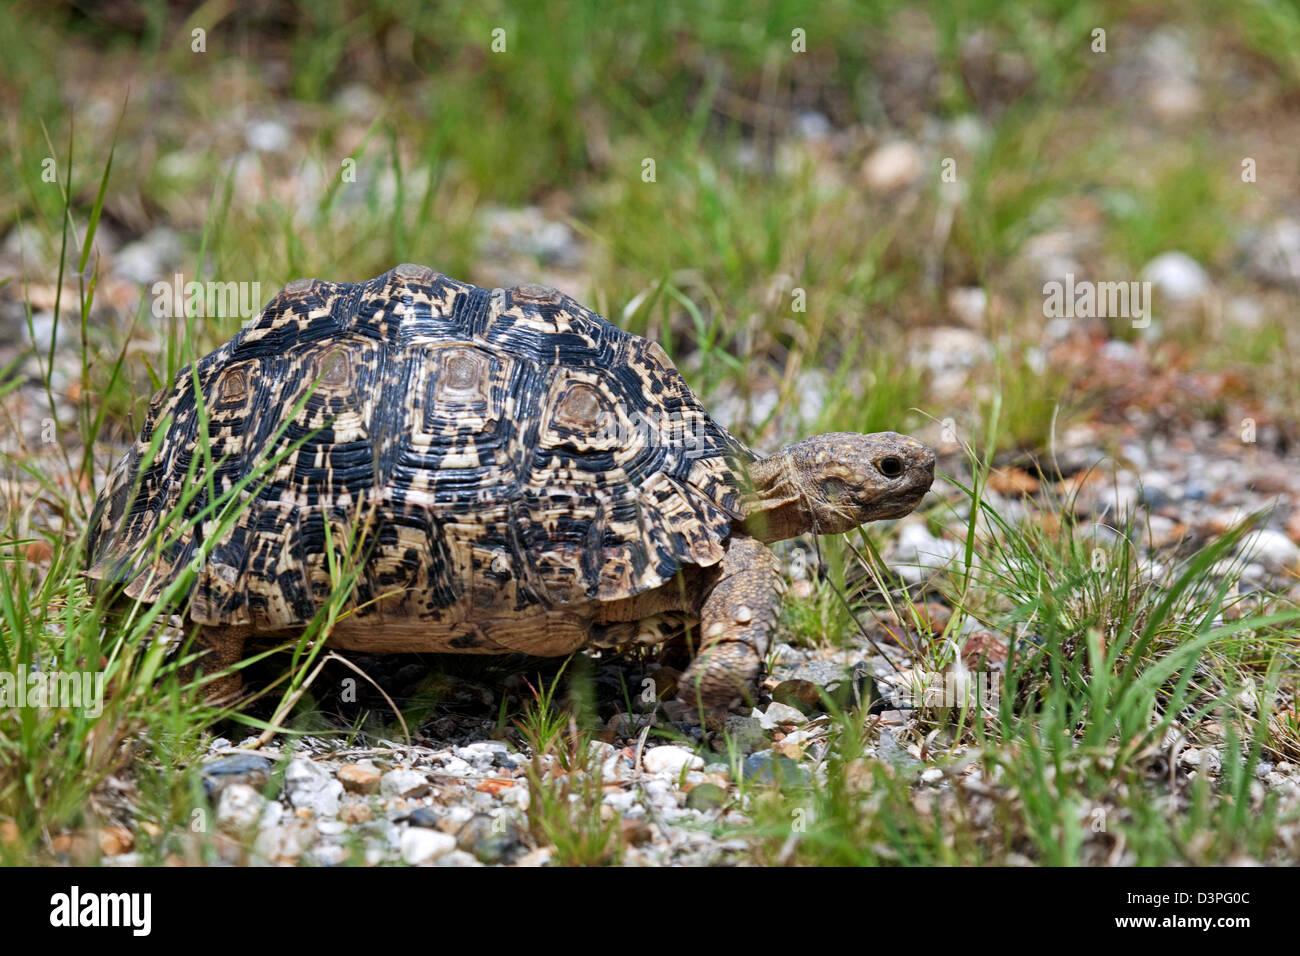 Leopard tortoise (Stigmochelys pardalis) in the Etosha National Park, Namibia, South Africa - Stock Image